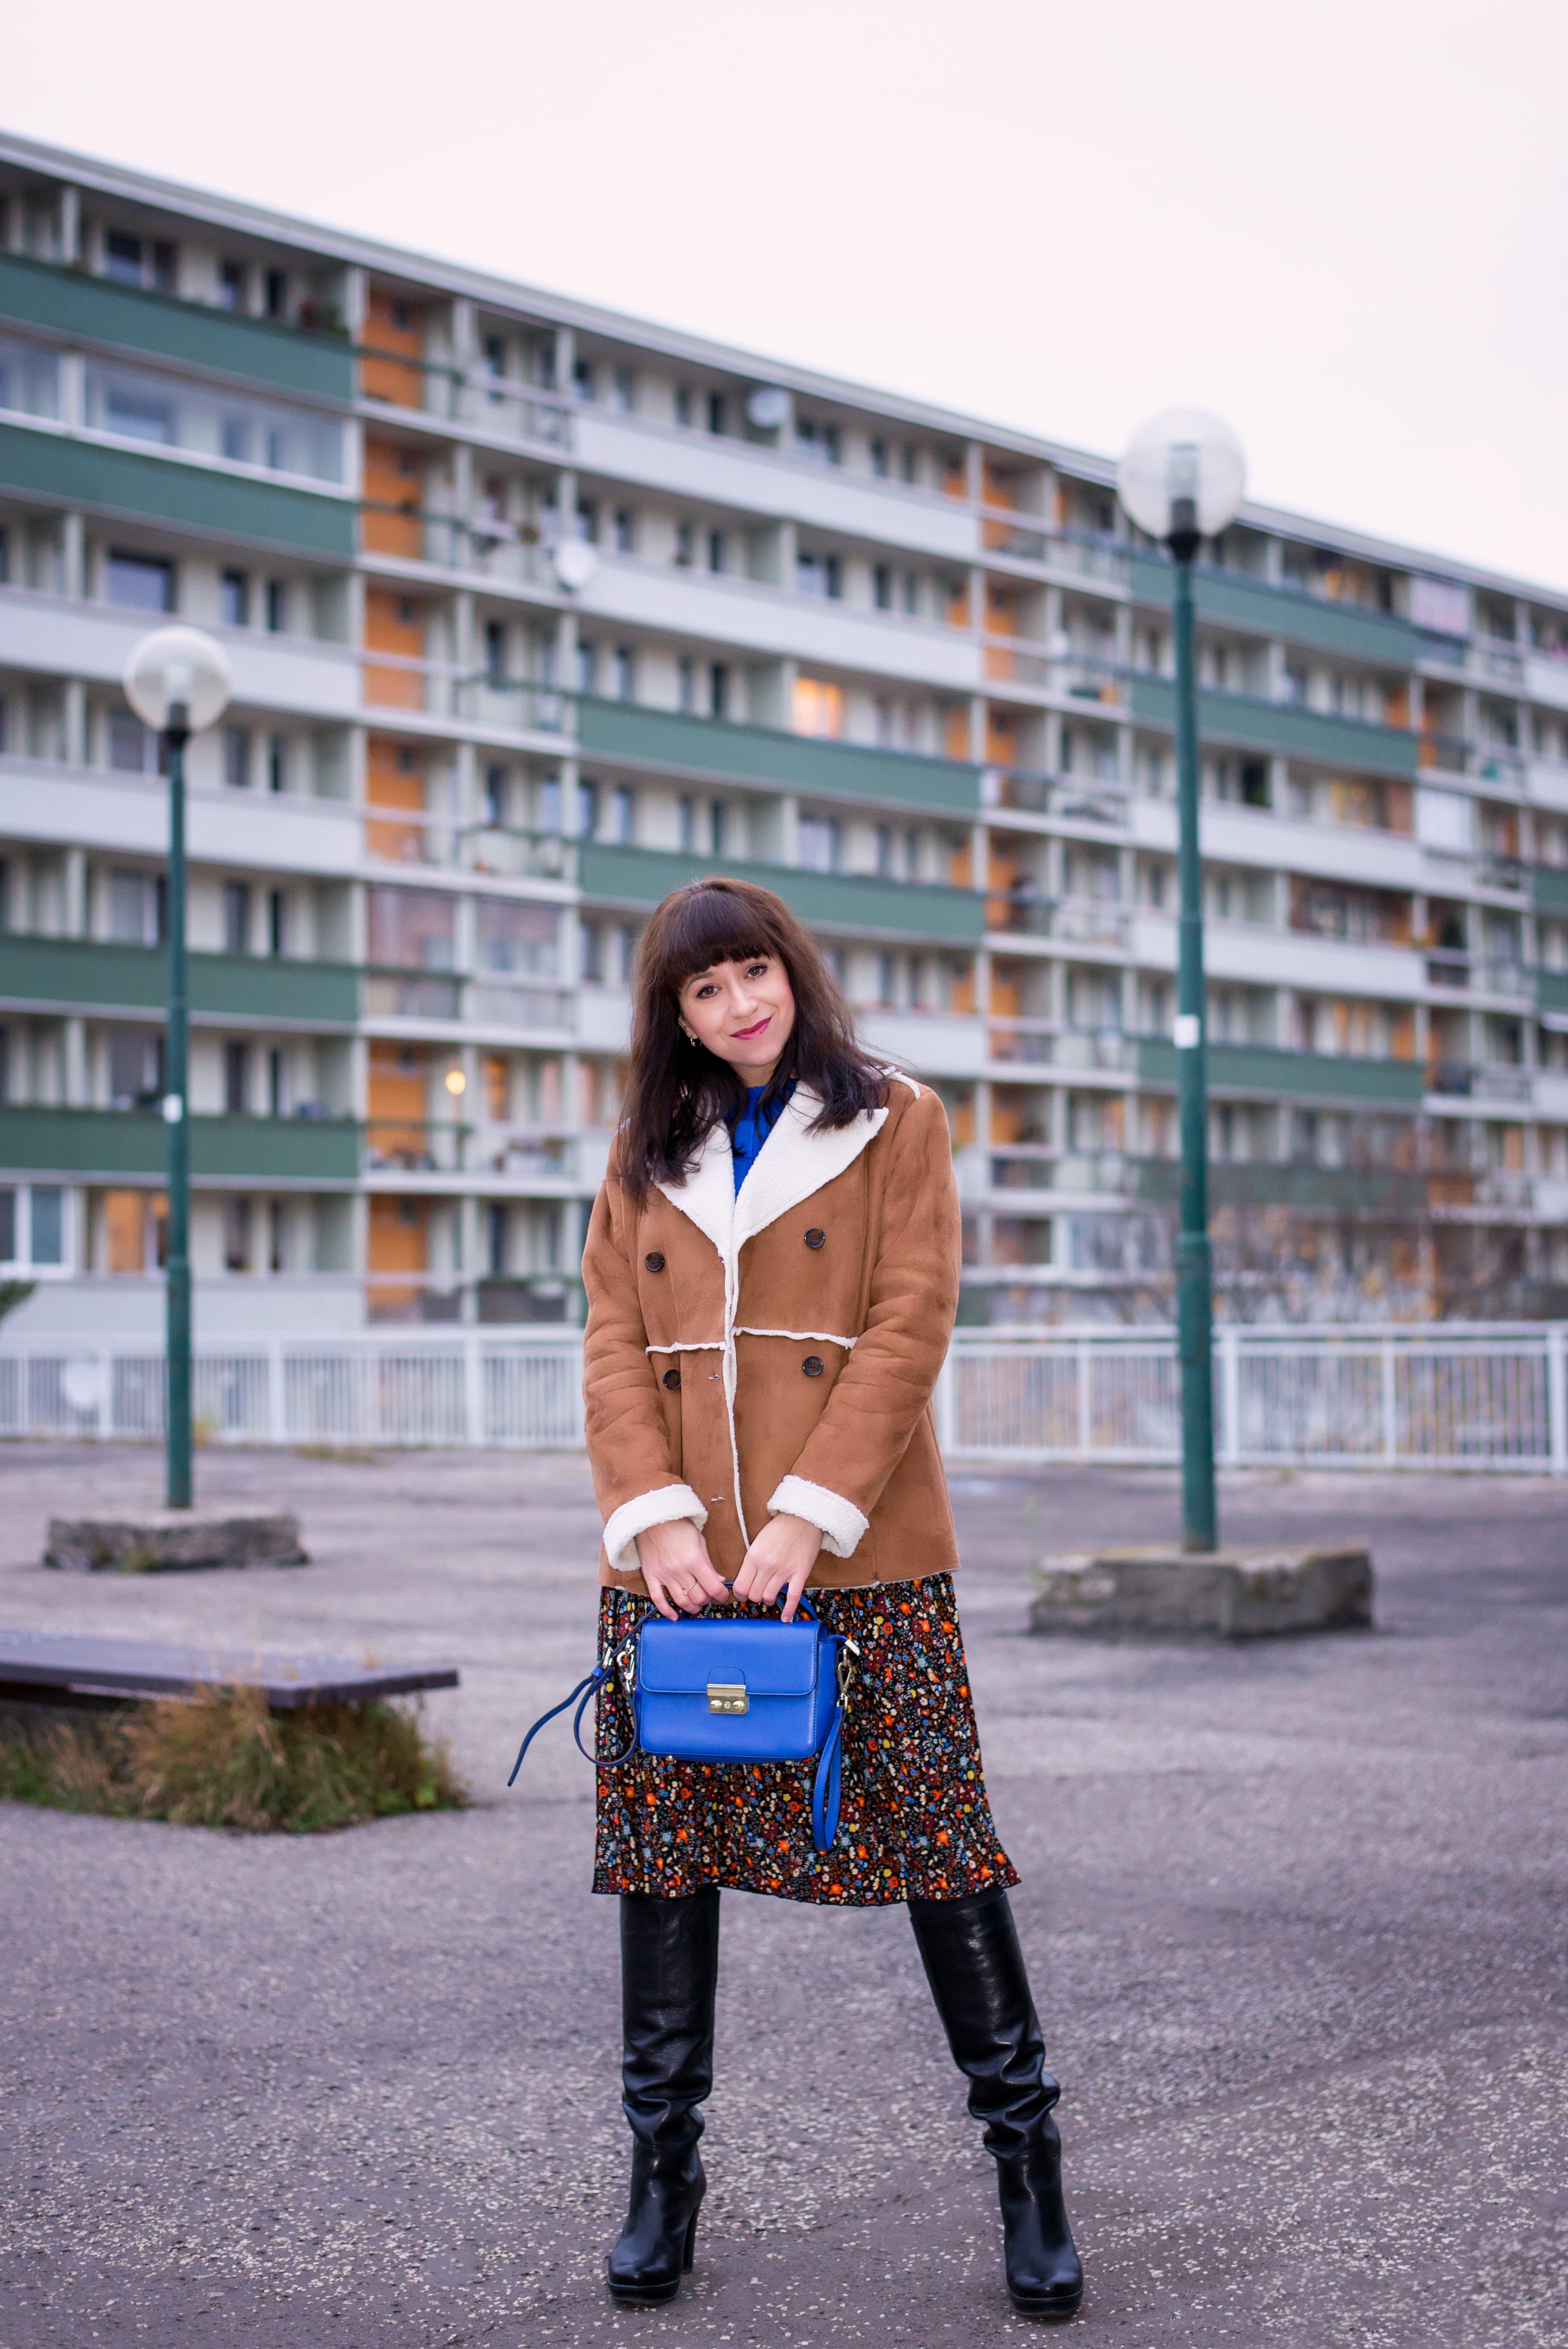 V NOWOM TARGU A SEMIŠOVÁ BUNDA NIELEN PRE BLOGERKU_Katharina-fashion is beautiful blog 10_Kvetovaná plisovaná sukňa_Kabelka JEJ_Katarína Jakubčová_Fashion blogerka